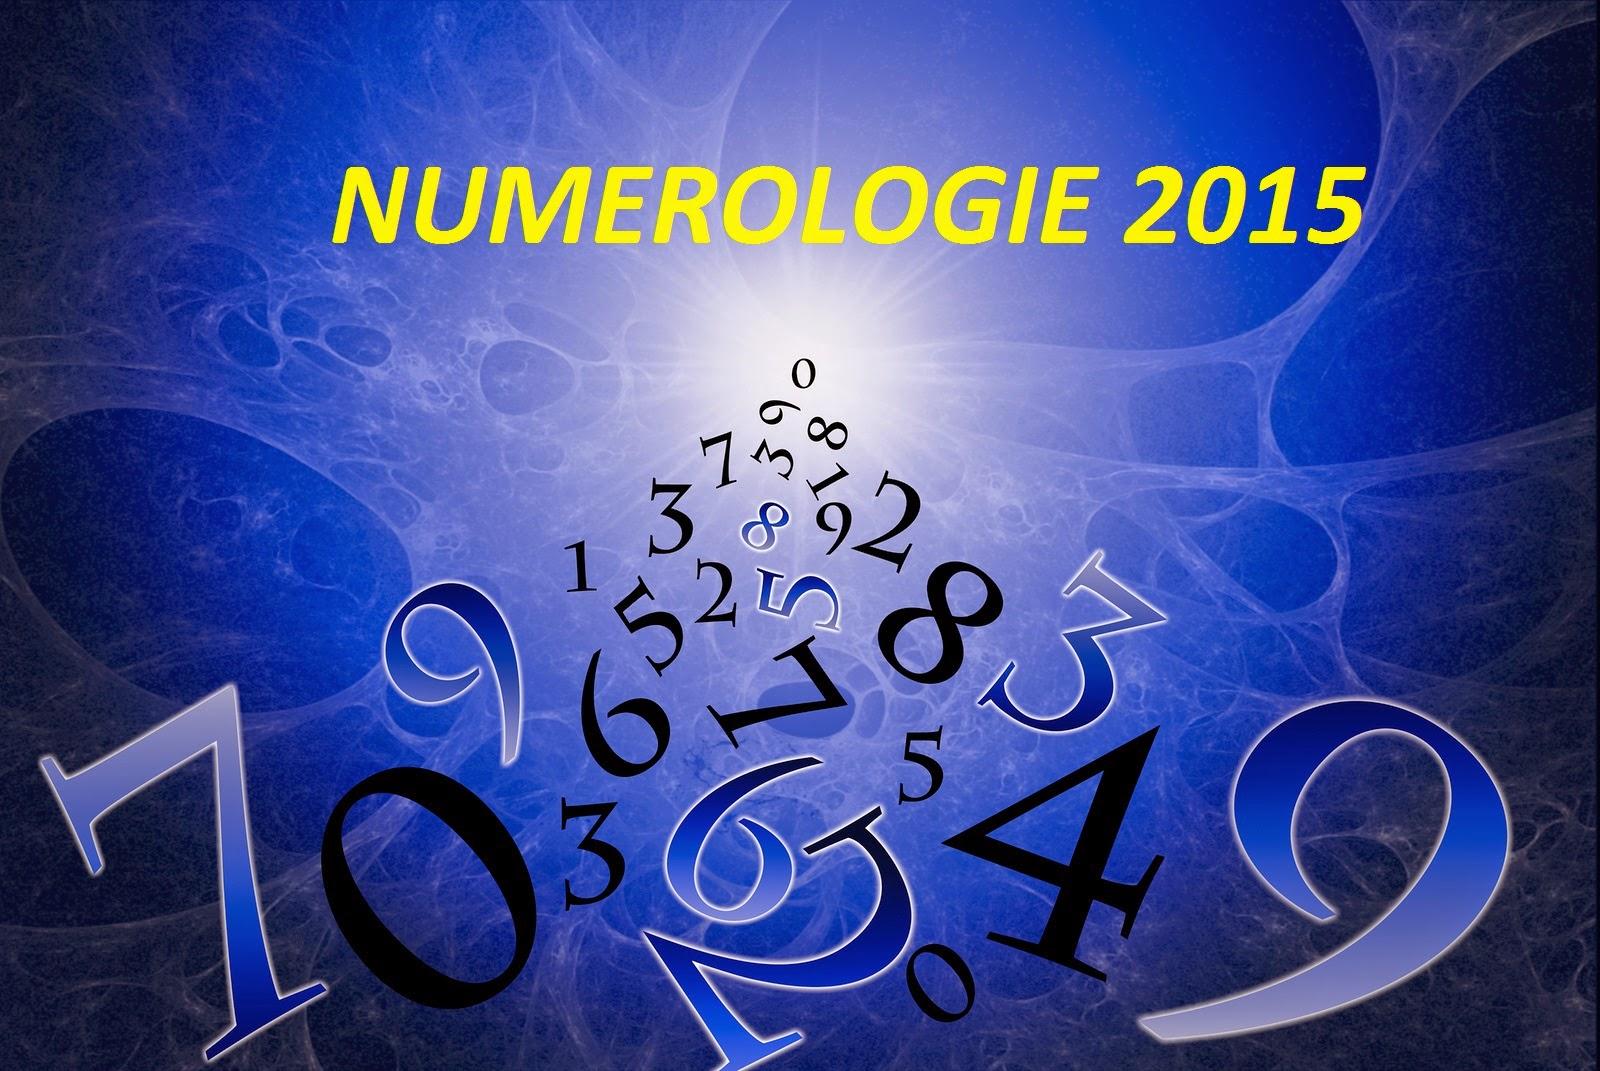 Numerologie 2015